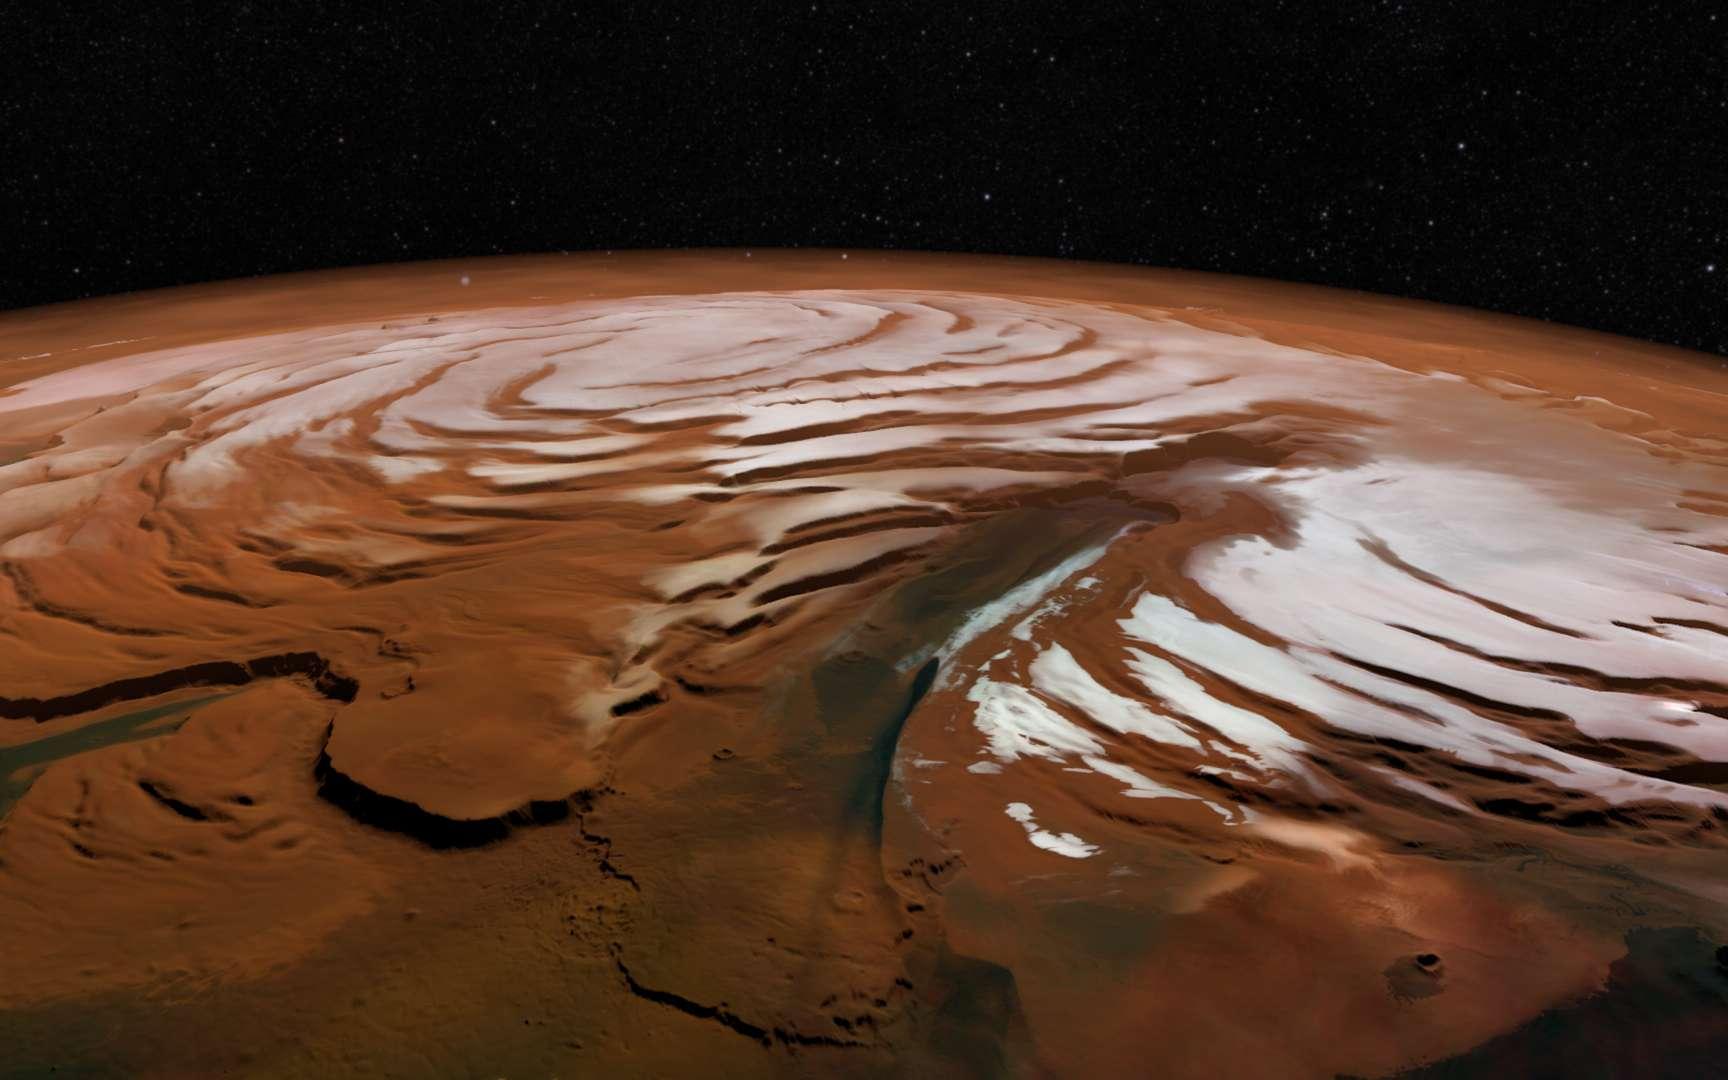 Vue en perspective de la calotte glaciaire qui recouvre actuellement le pôle Nord de Mars. Photo prise par la sonde Mars Express (ESA). © ESA, DLR, FU Berlin ; Nasa MGS Mola Science Team